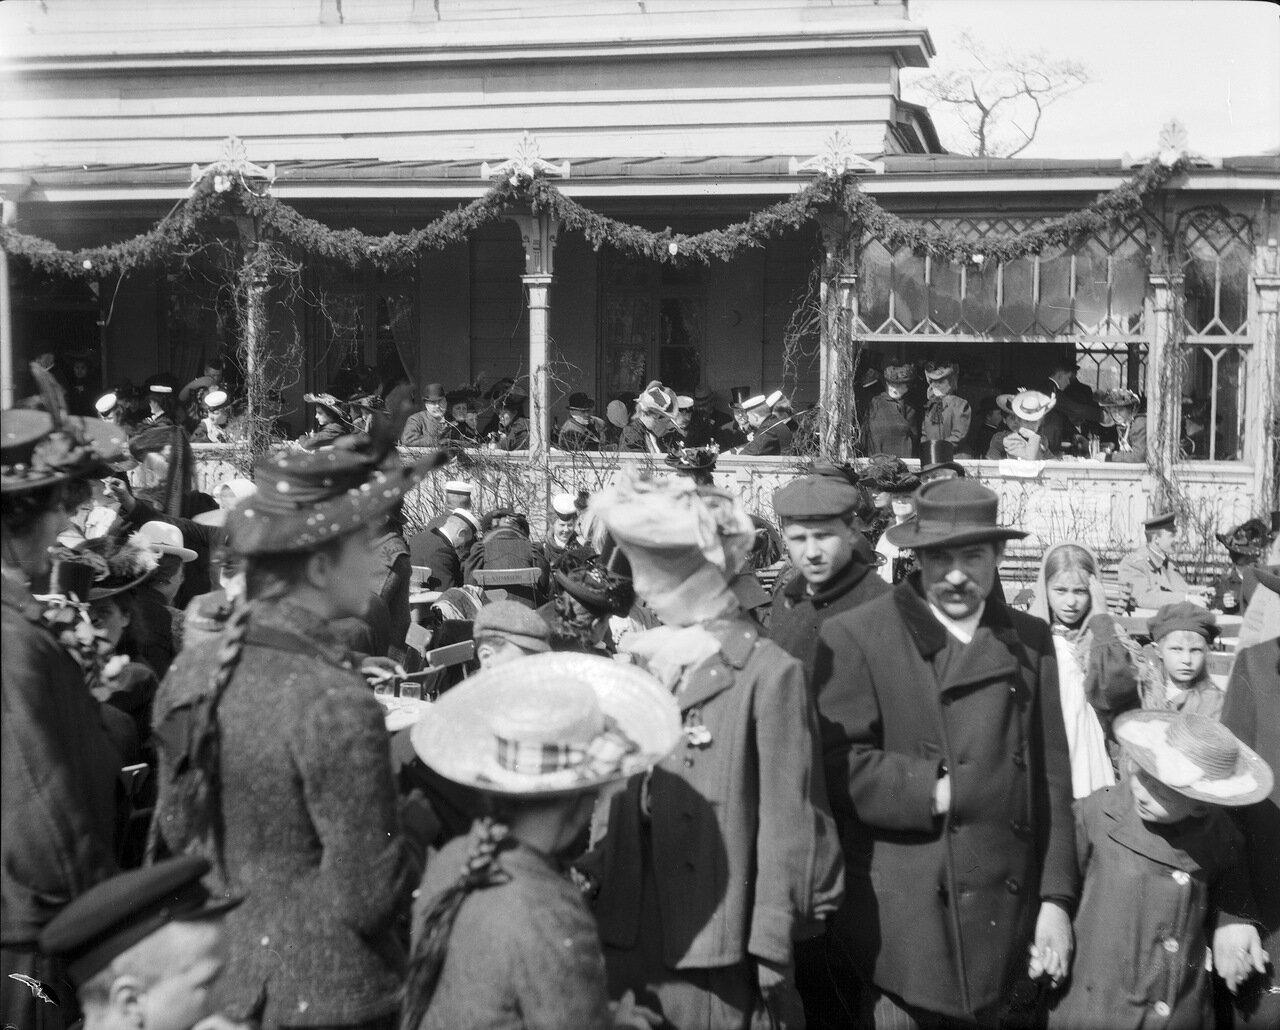 Каисаниеменкату, 1 мая 1906